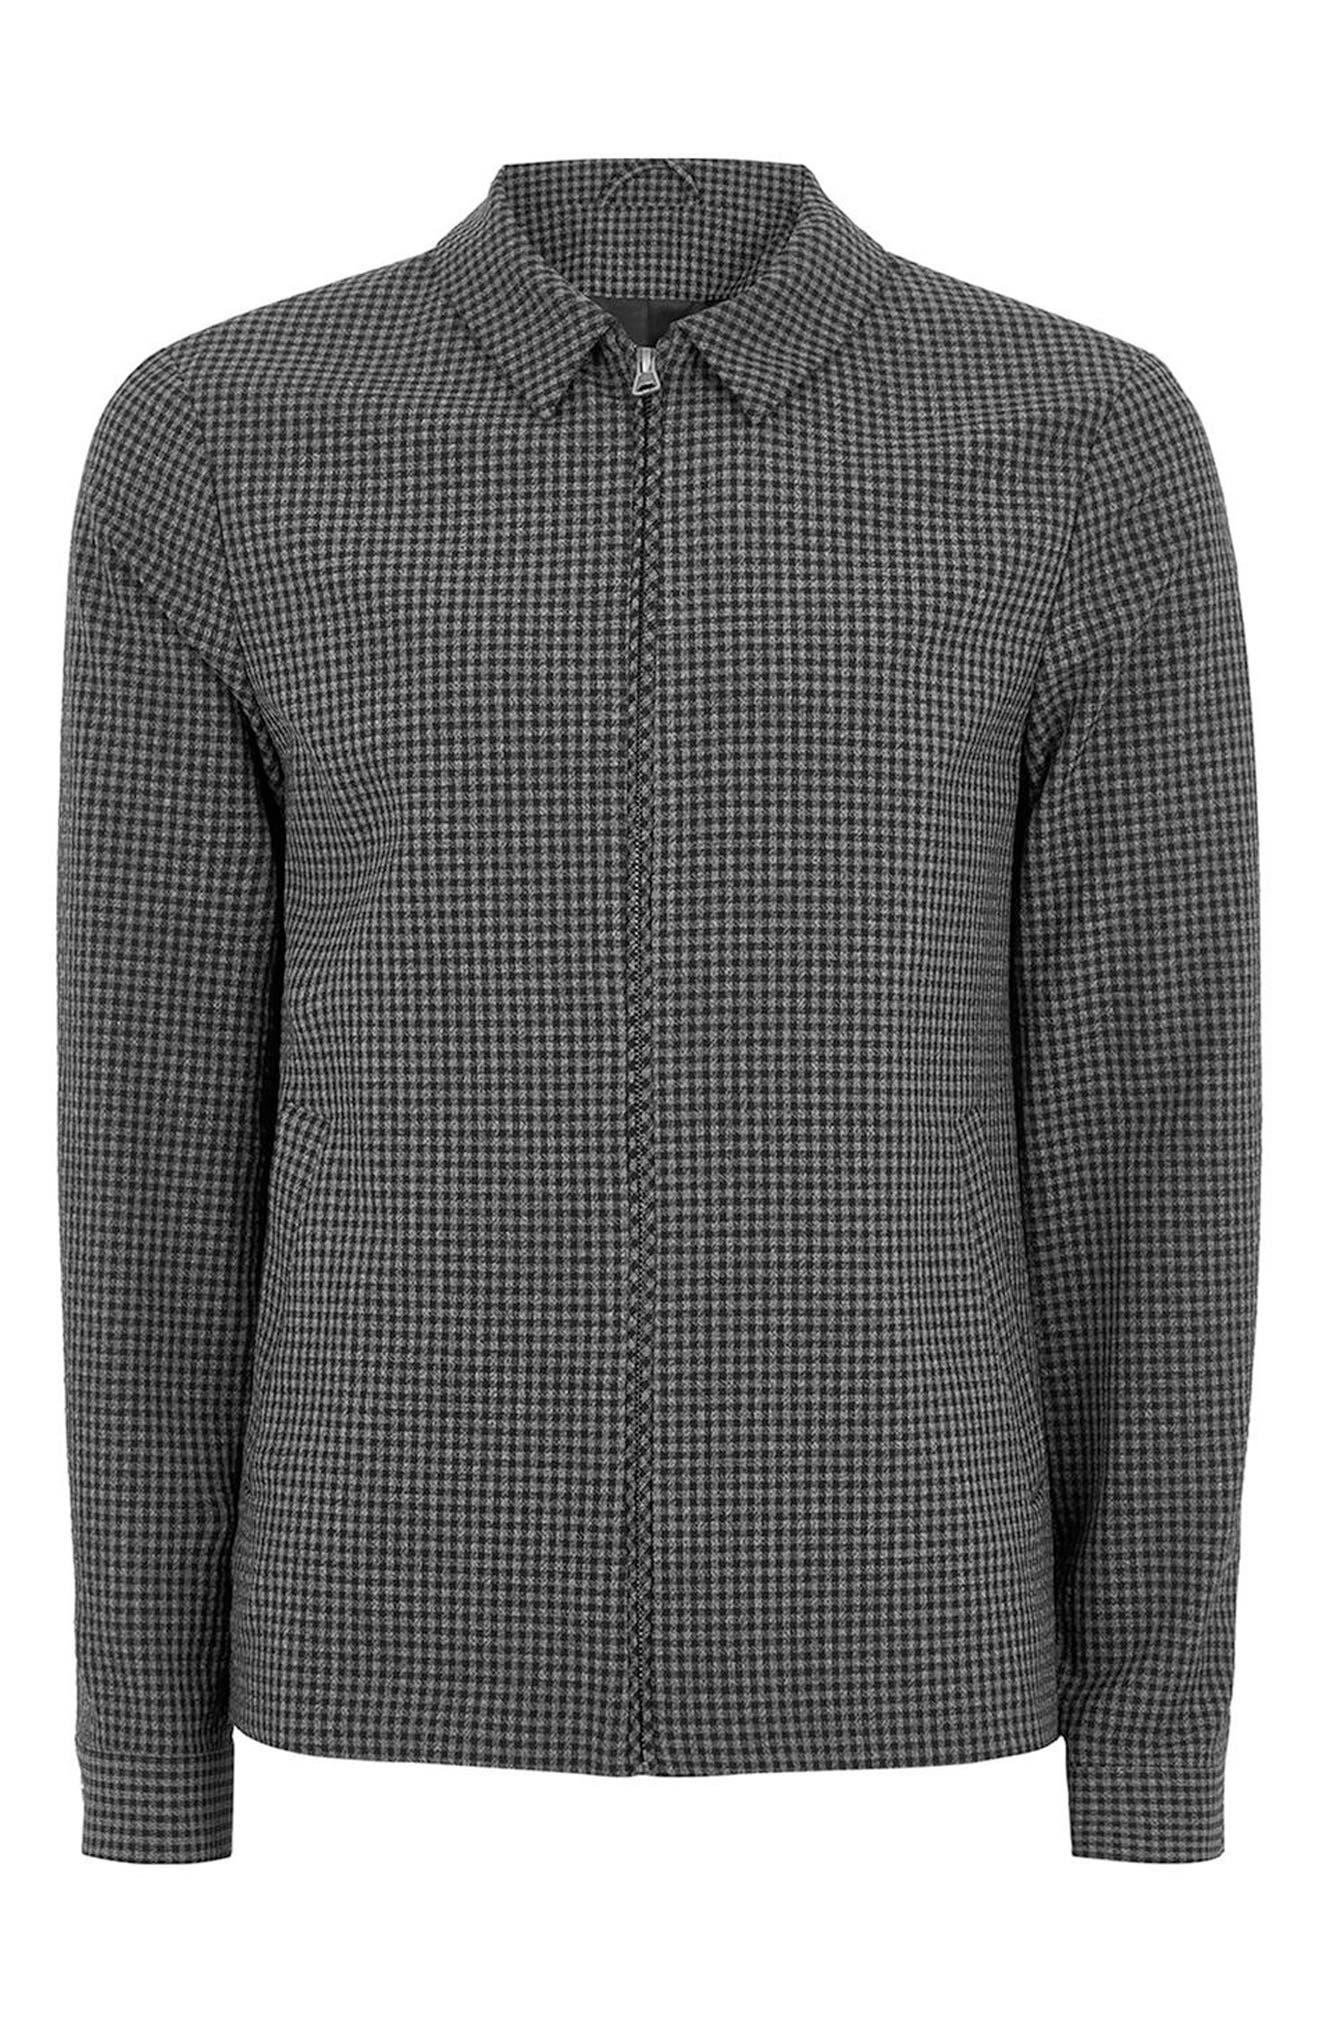 Gingham Harrington Jacket,                             Alternate thumbnail 3, color,                             020